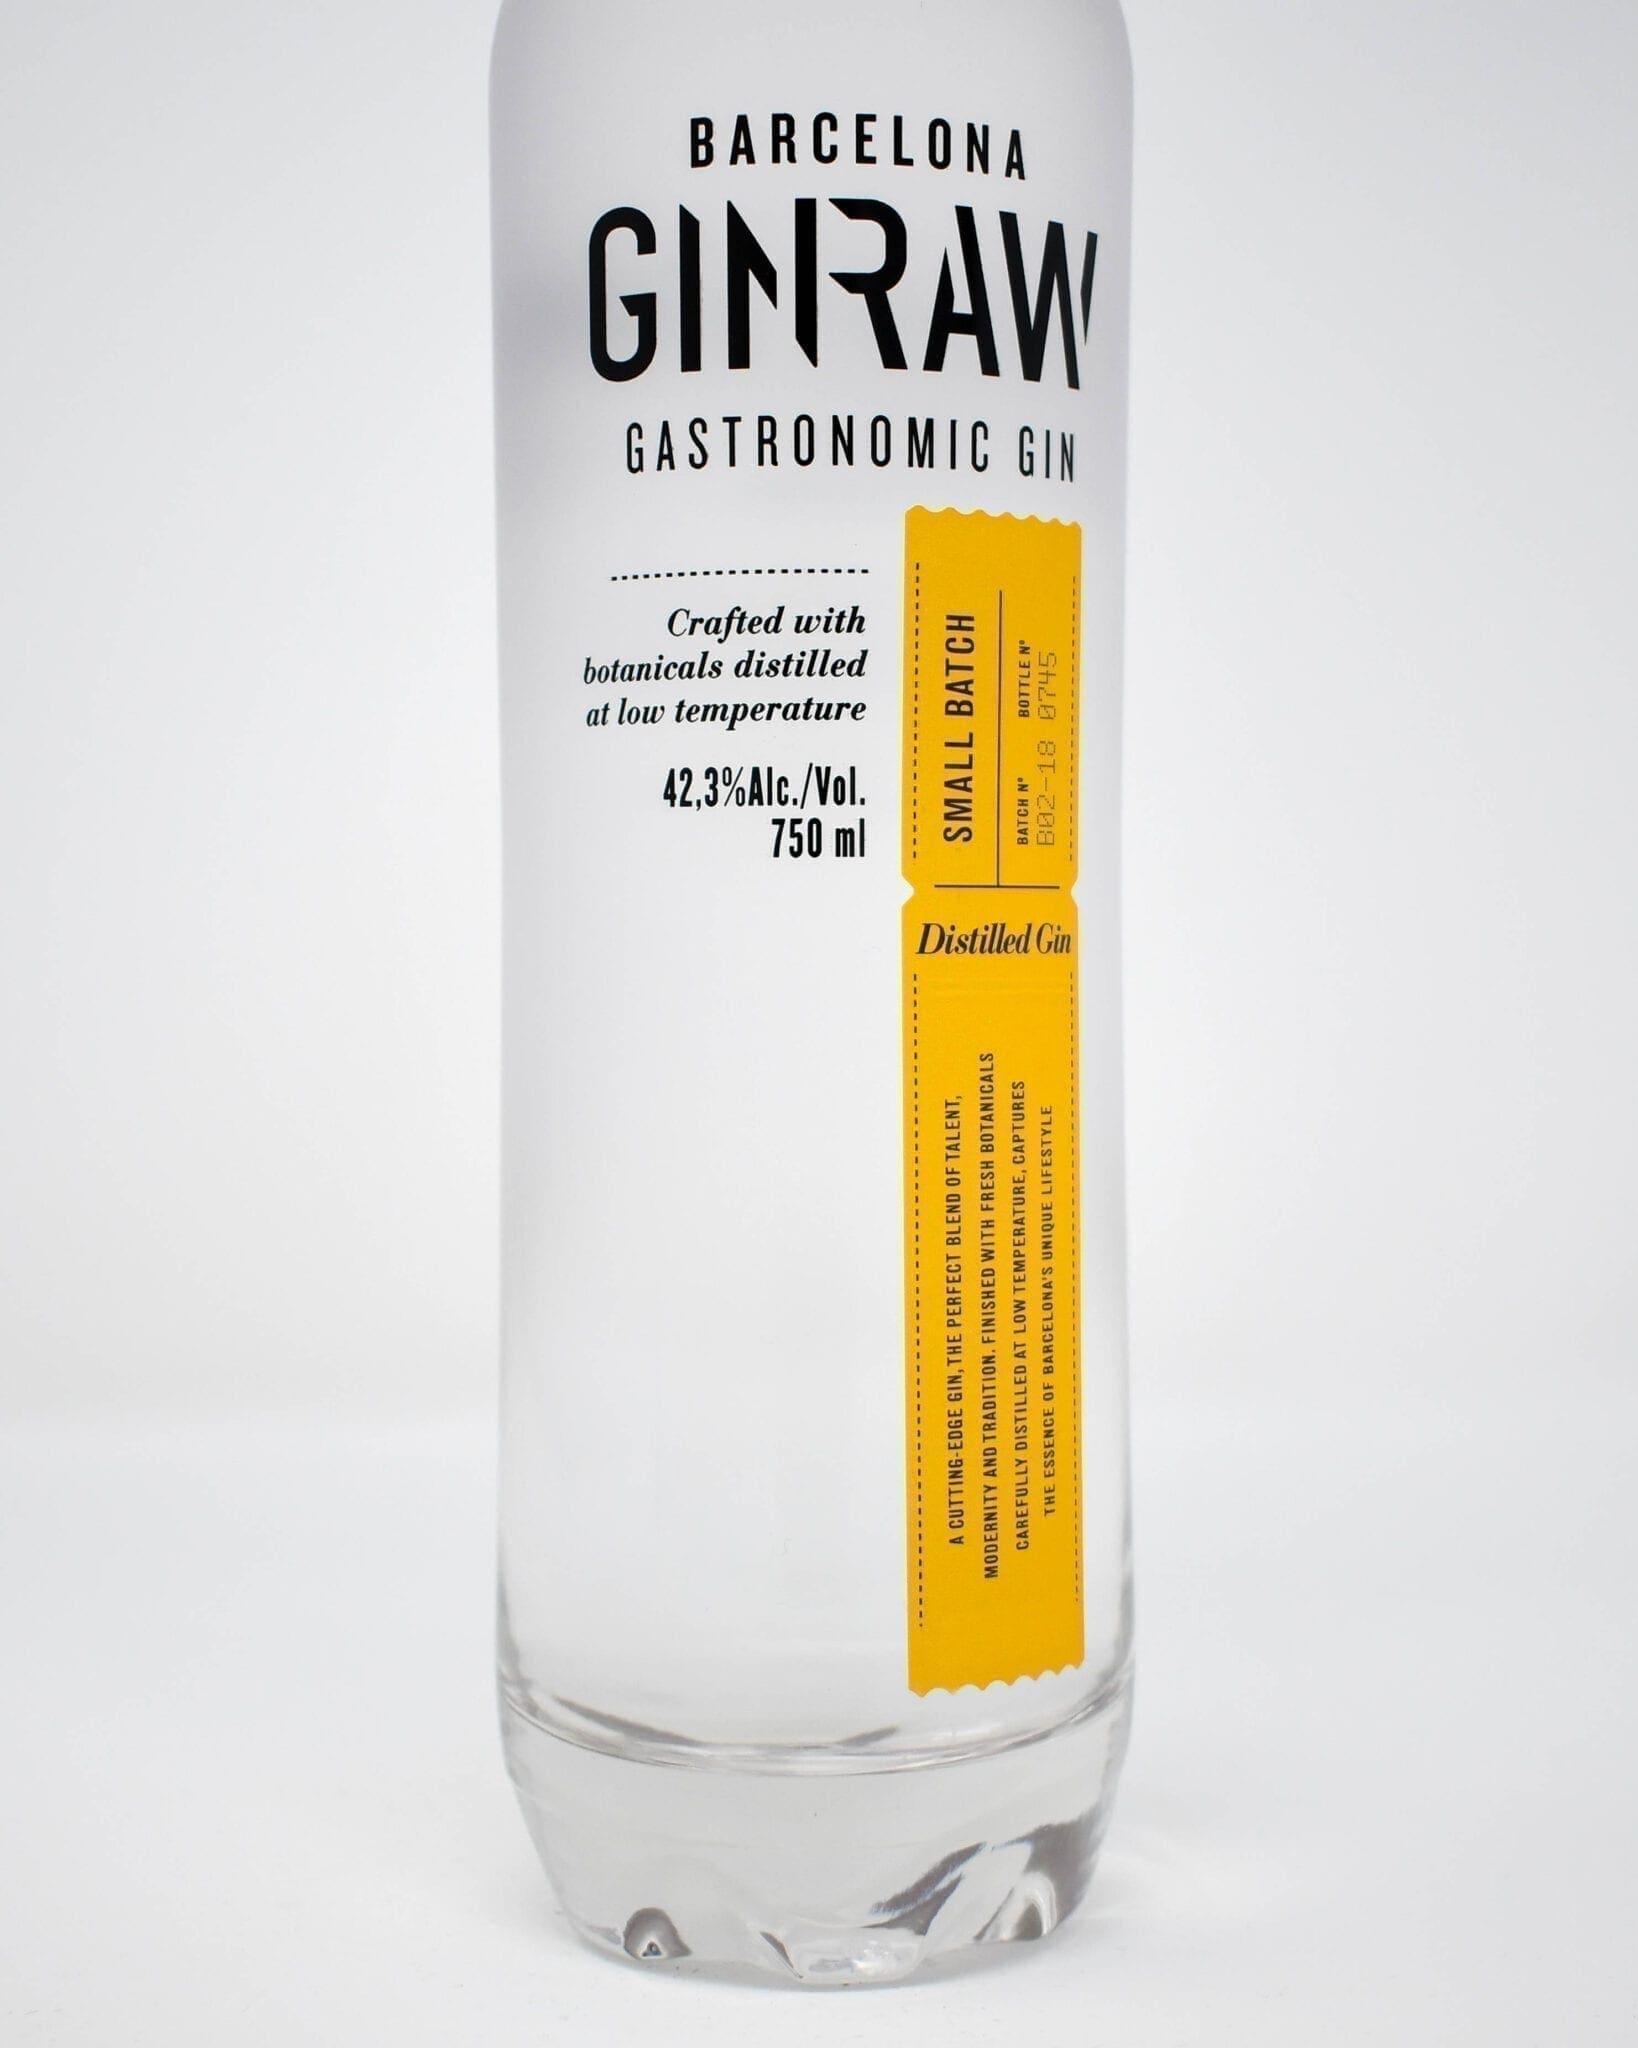 GINRAW, Gastronomic Gin